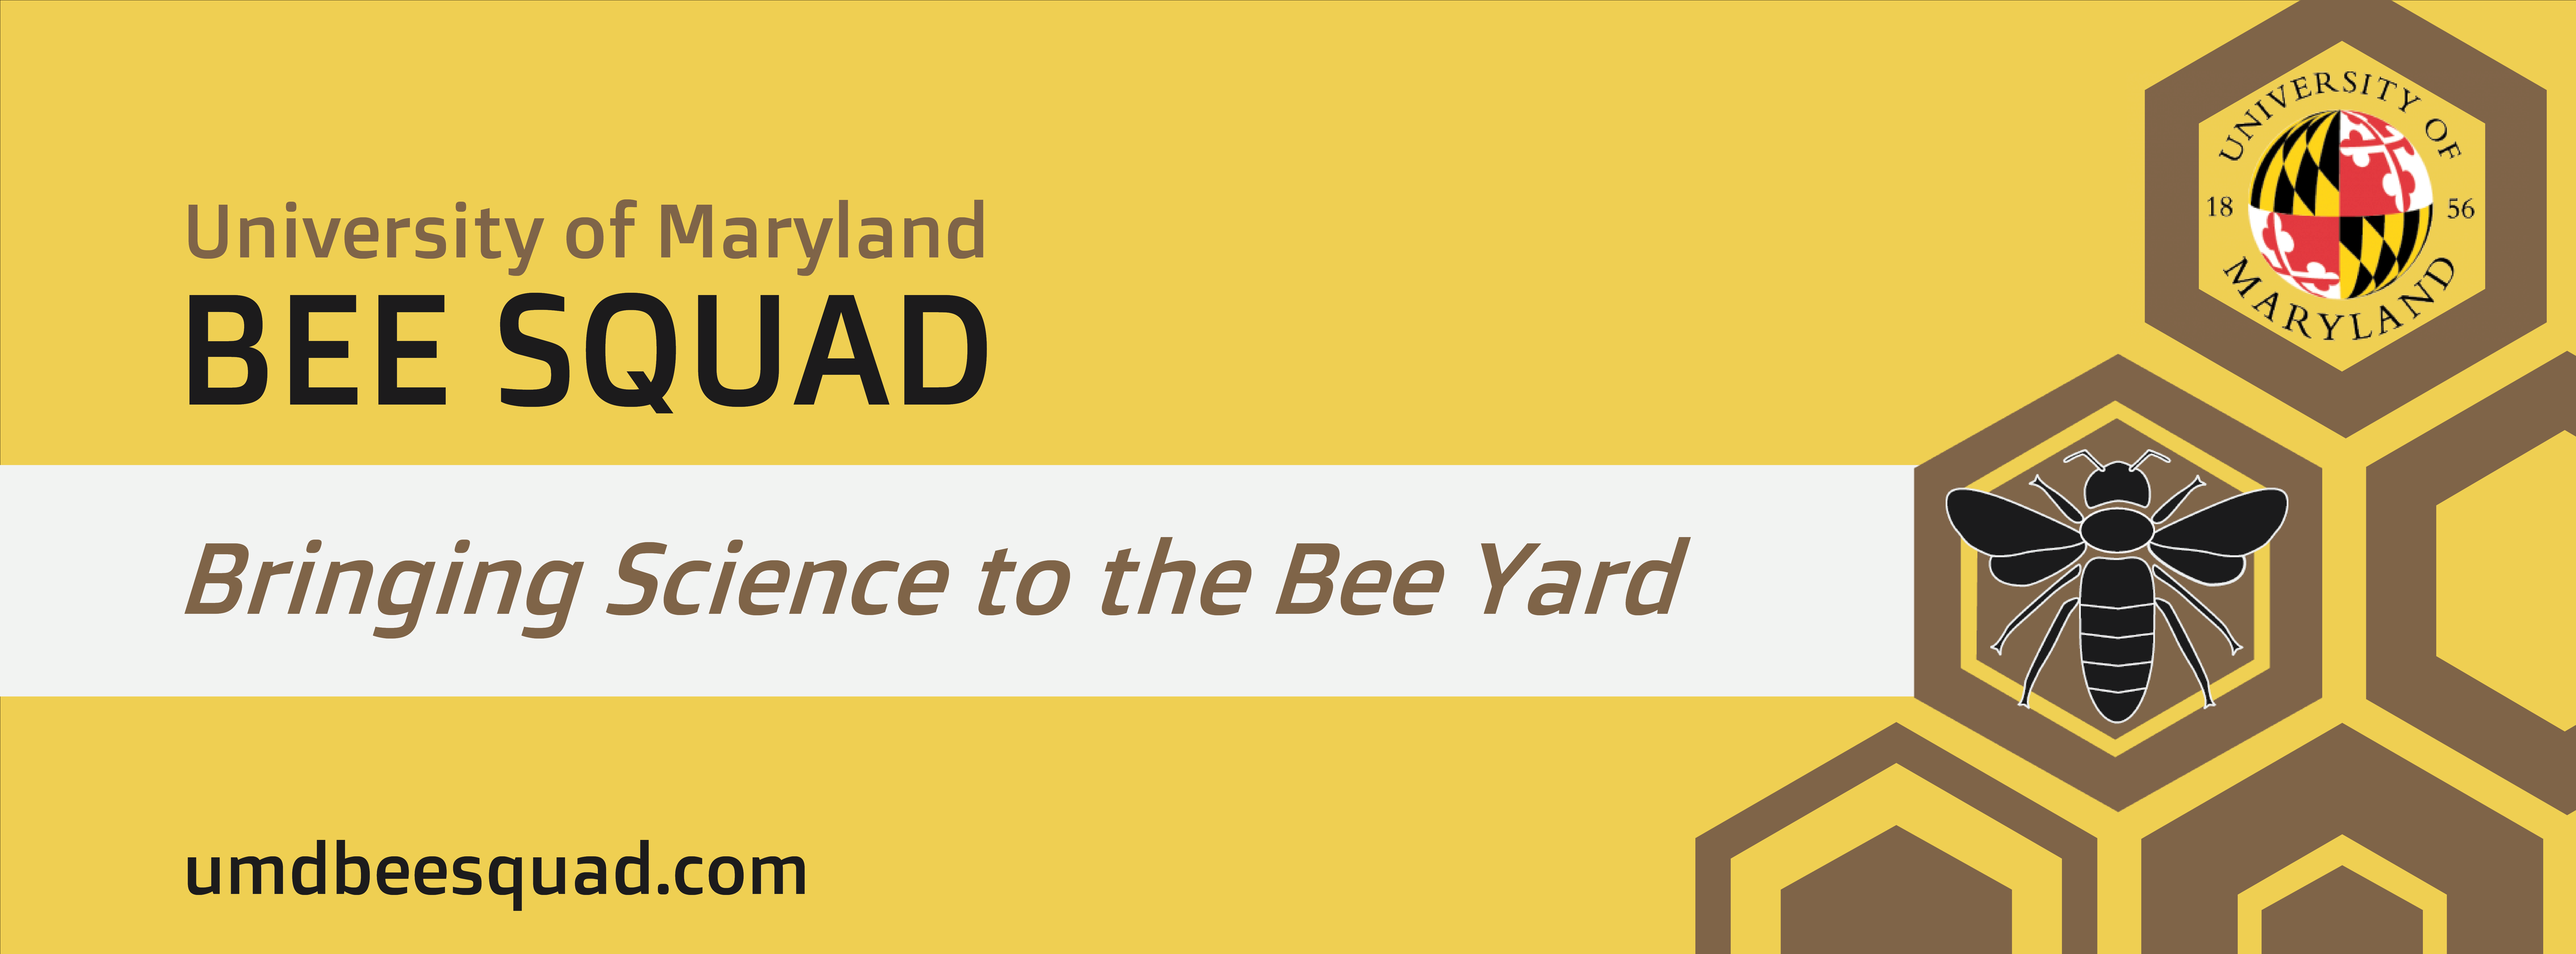 UMD Bee Squad